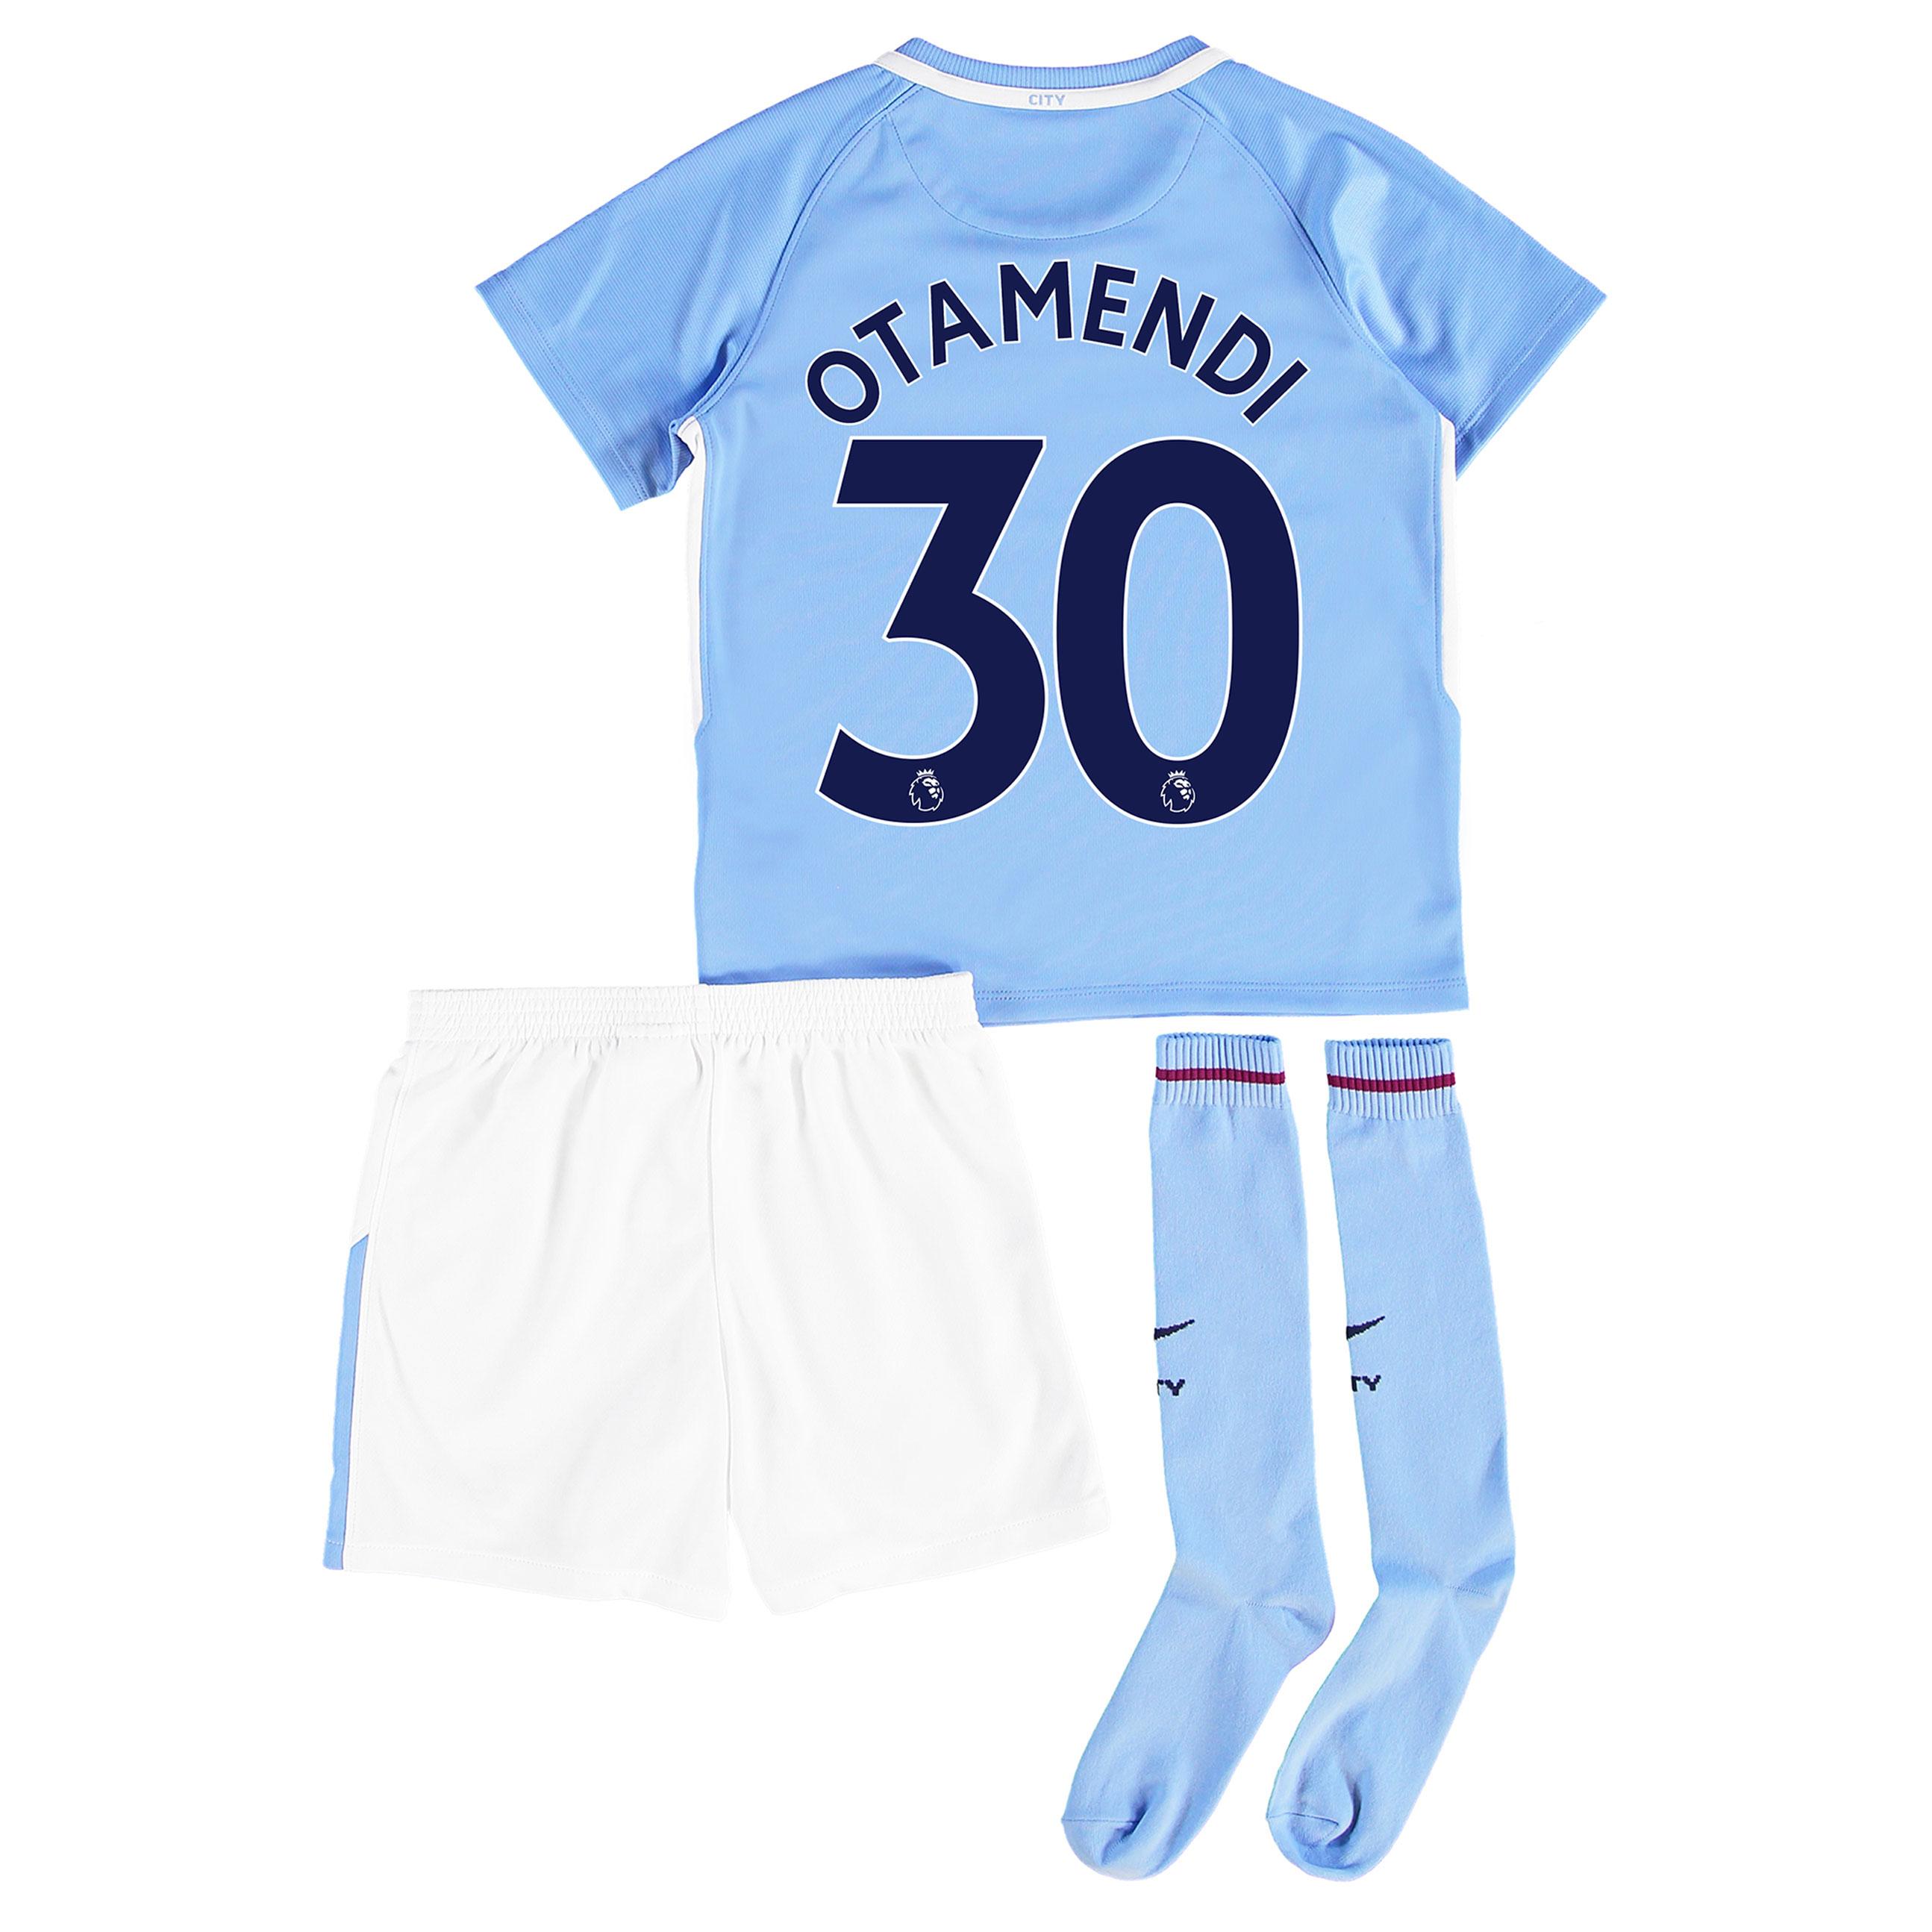 Manchester City Home Stadium Kit 2017-18 - Little Kids with Otamendi 3